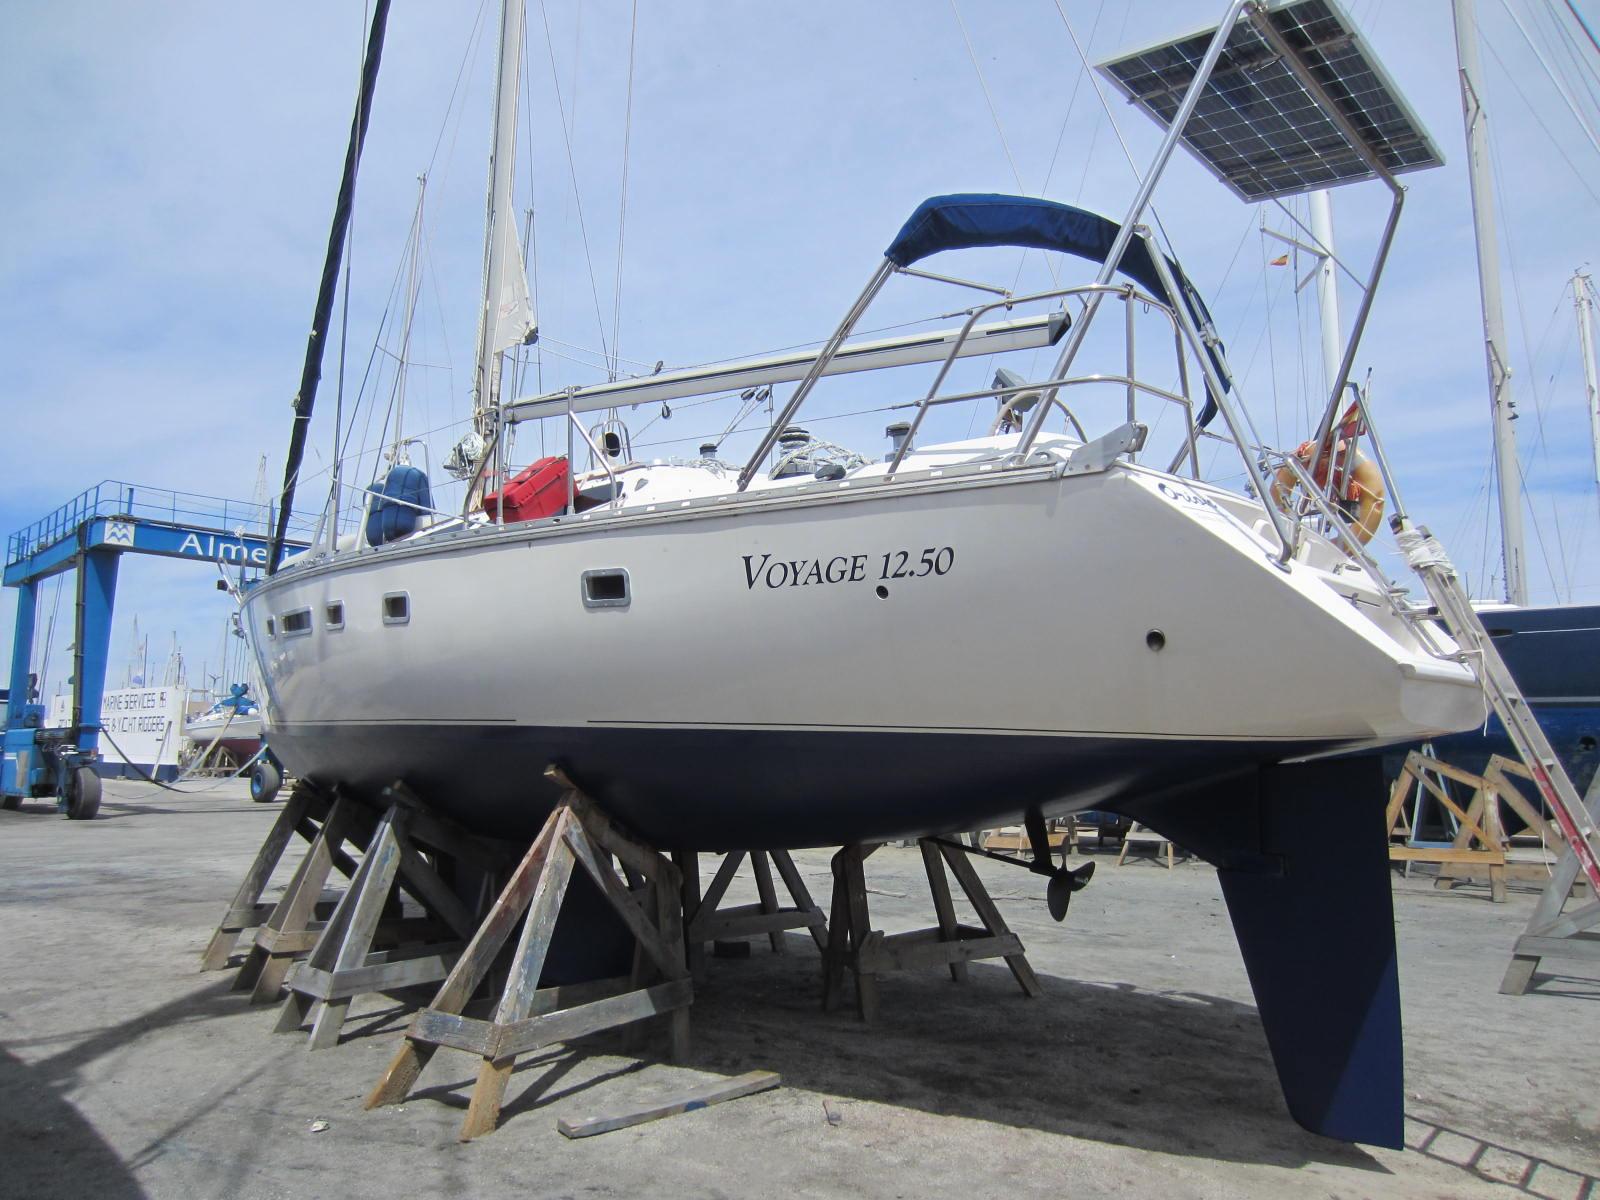 link to Jeanneau Voyage 12.50